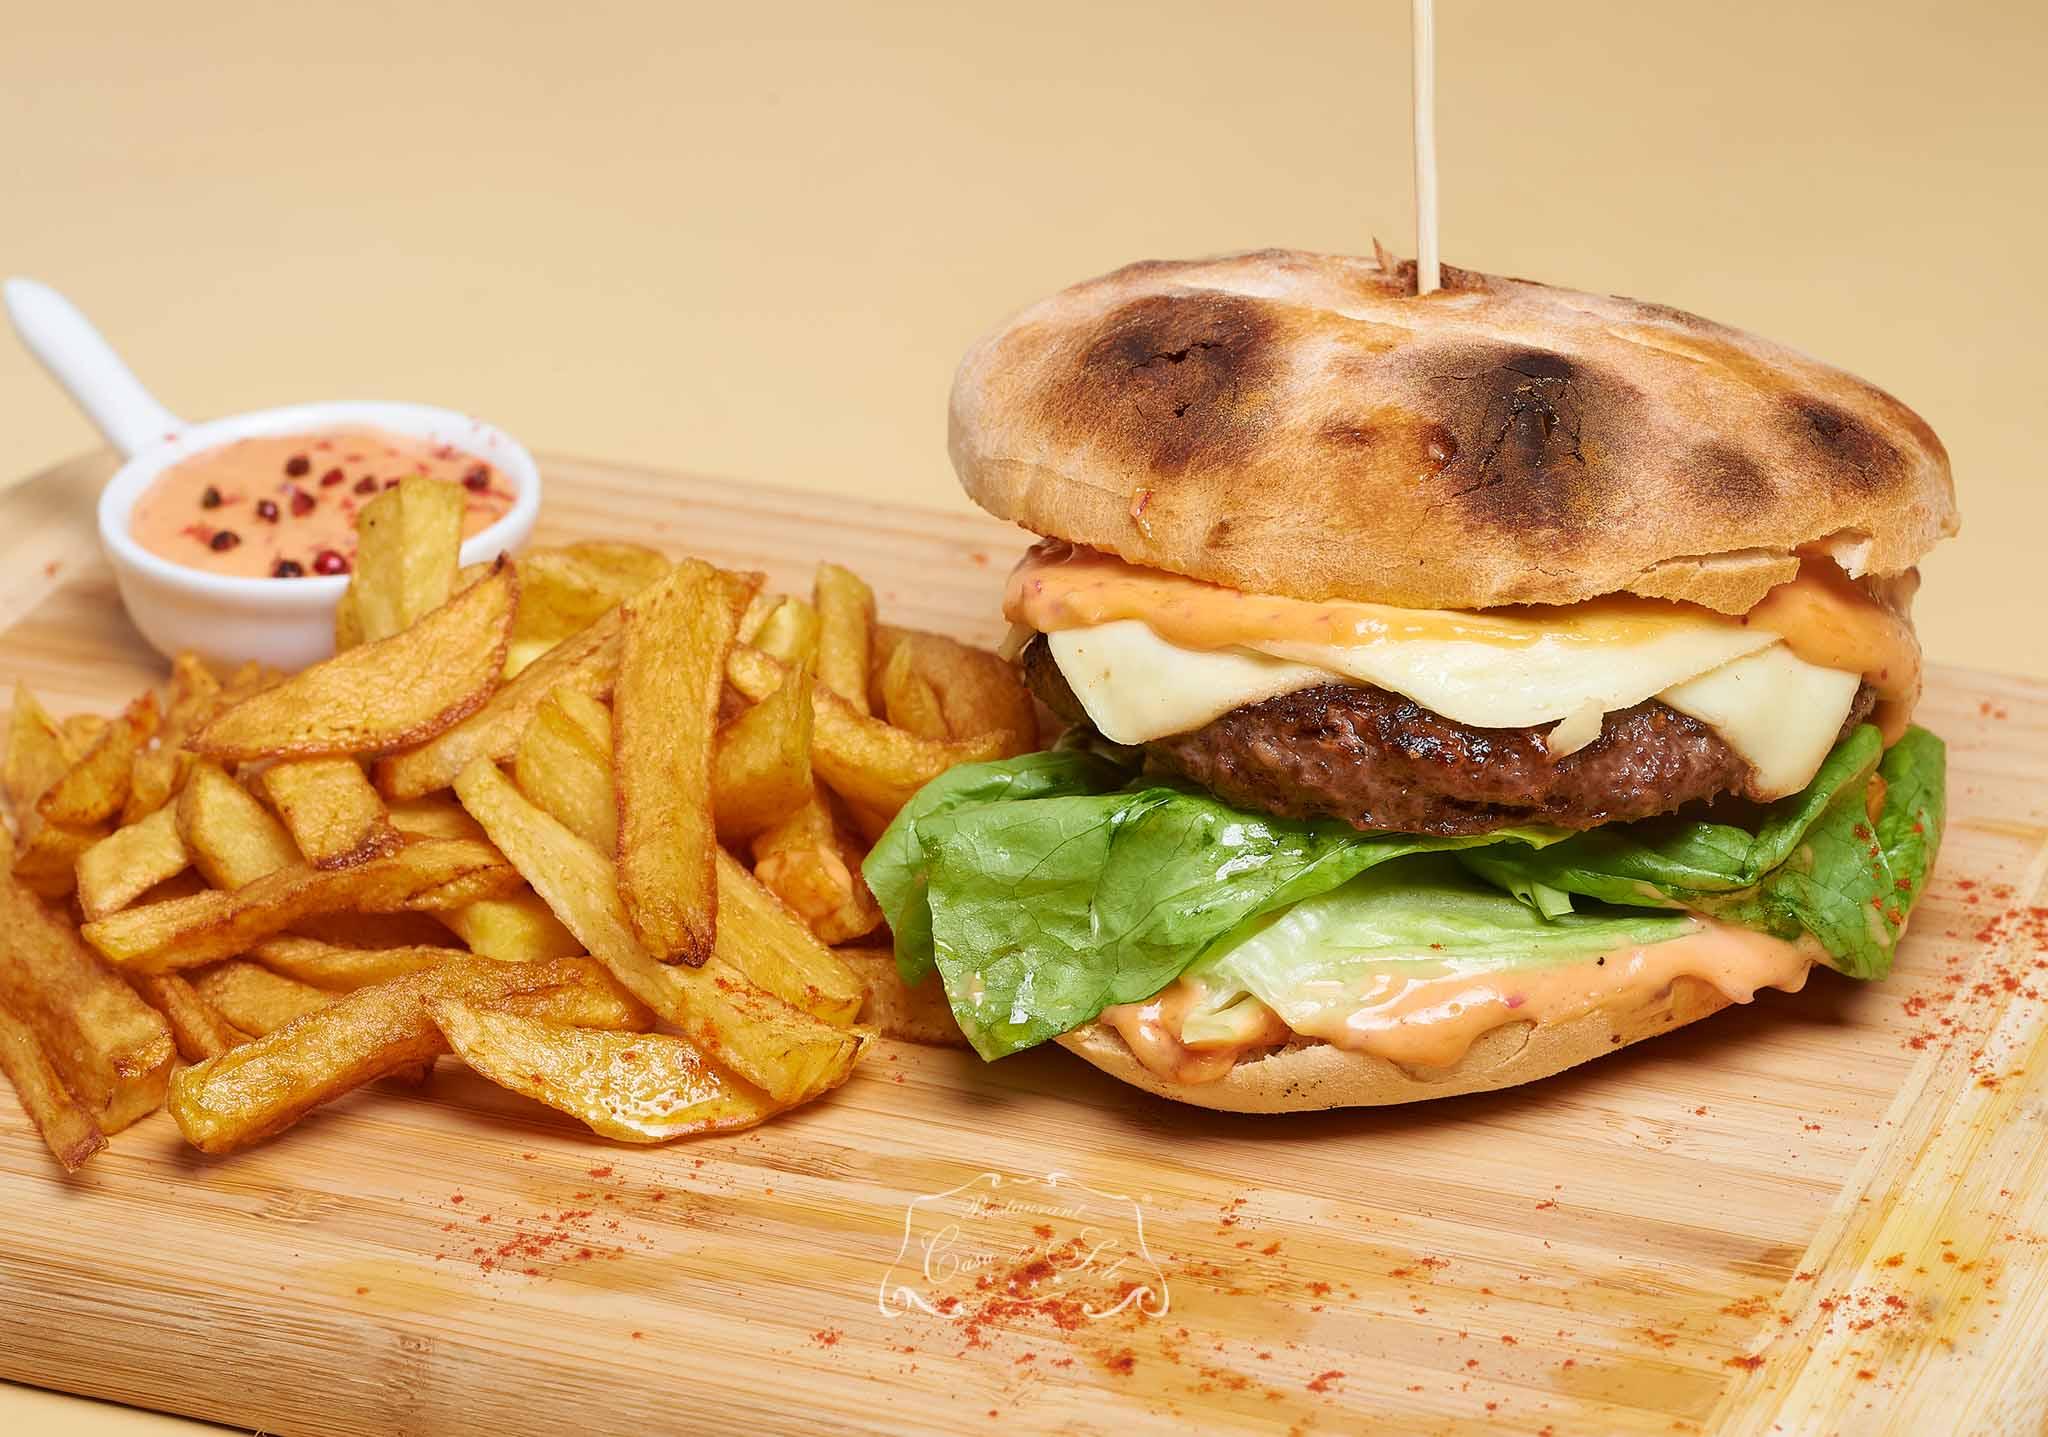 Livram la domiciliu Burger reinterpretat (100% made in house) in Timisoara